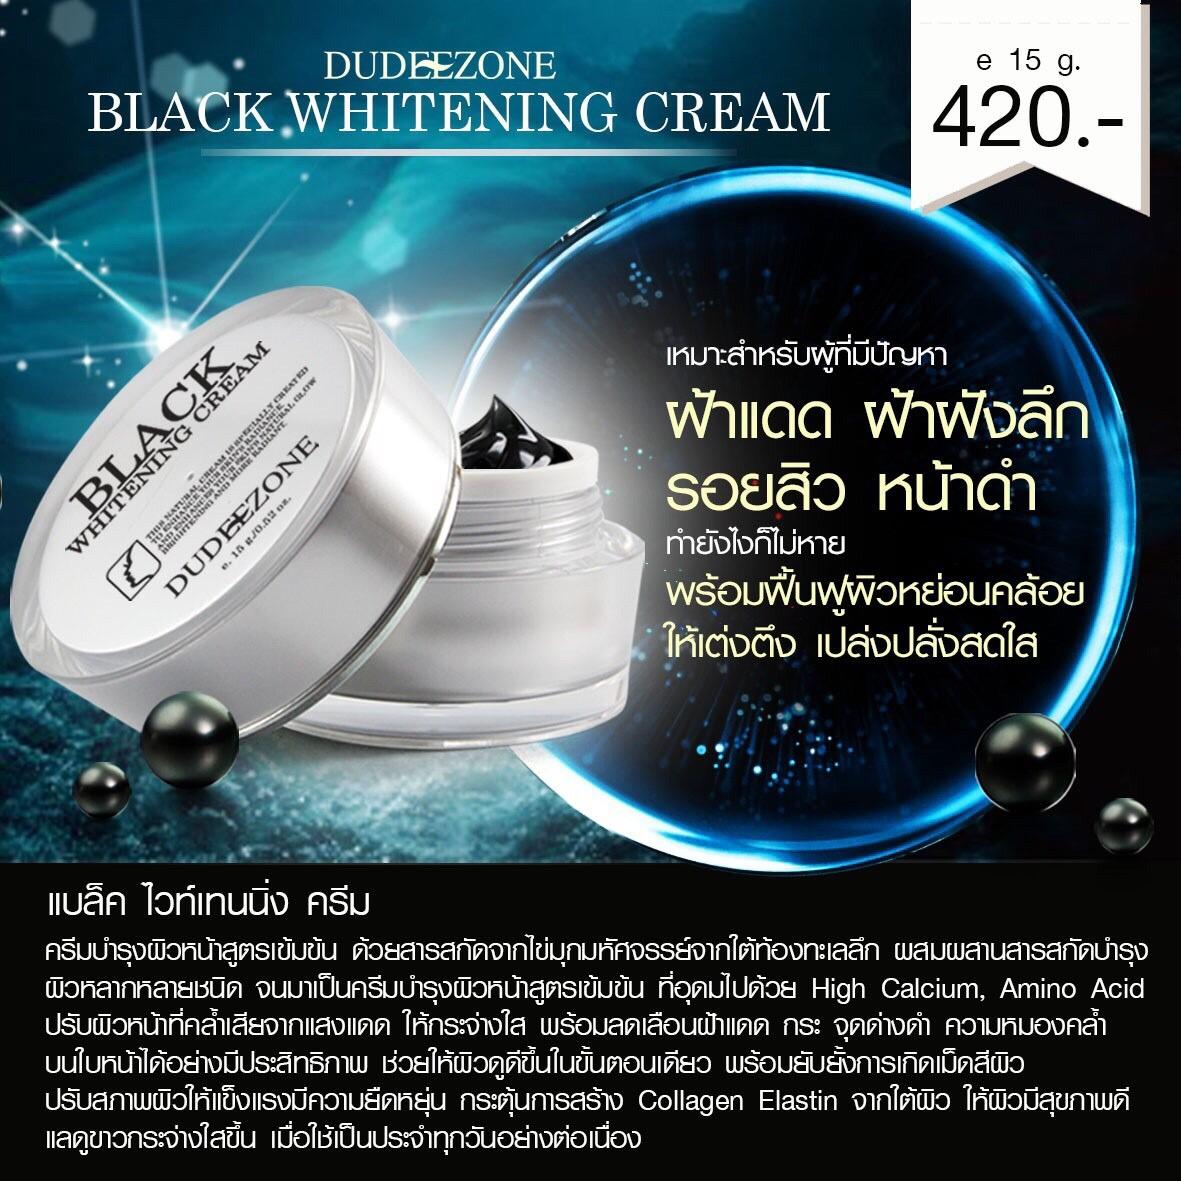 Black Whitening Cream แบล็ค ไวท์เทนนิ่ง ครีม